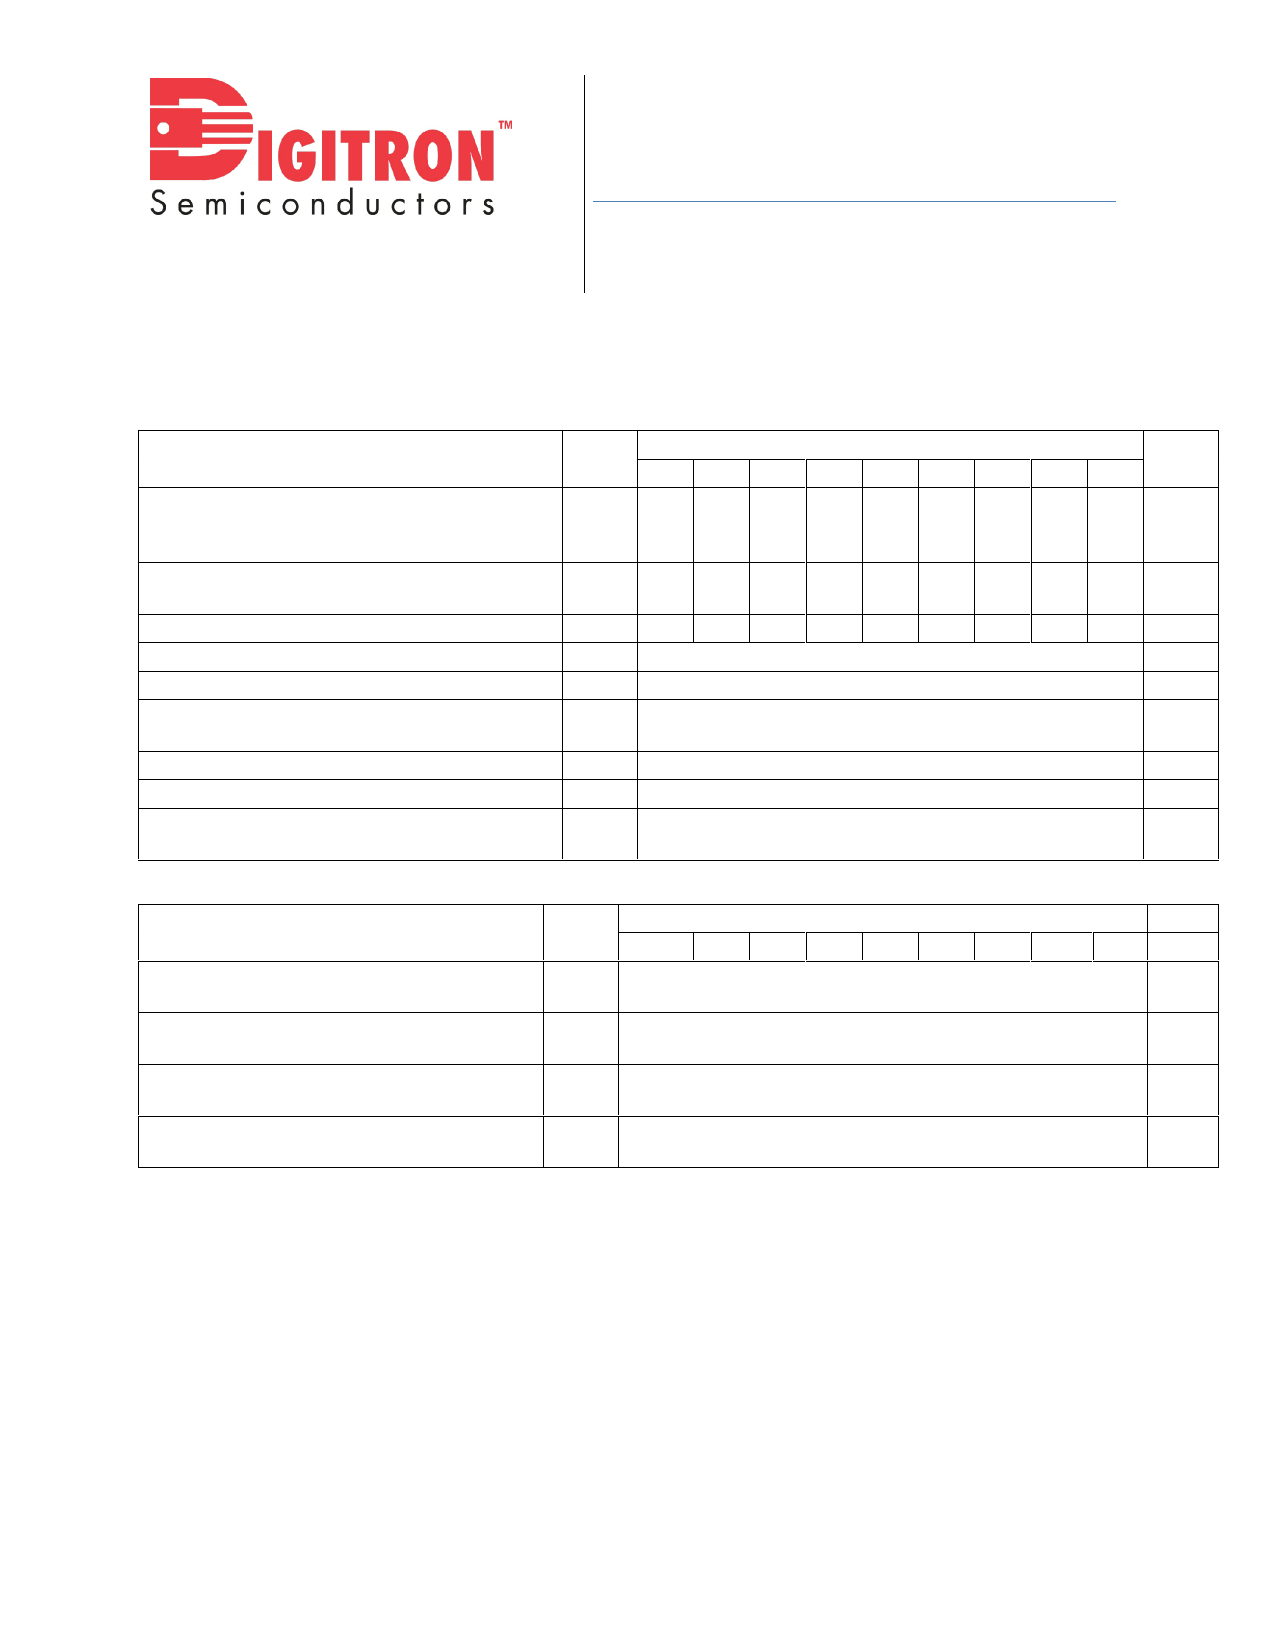 MR1128 데이터시트 및 MR1128 PDF